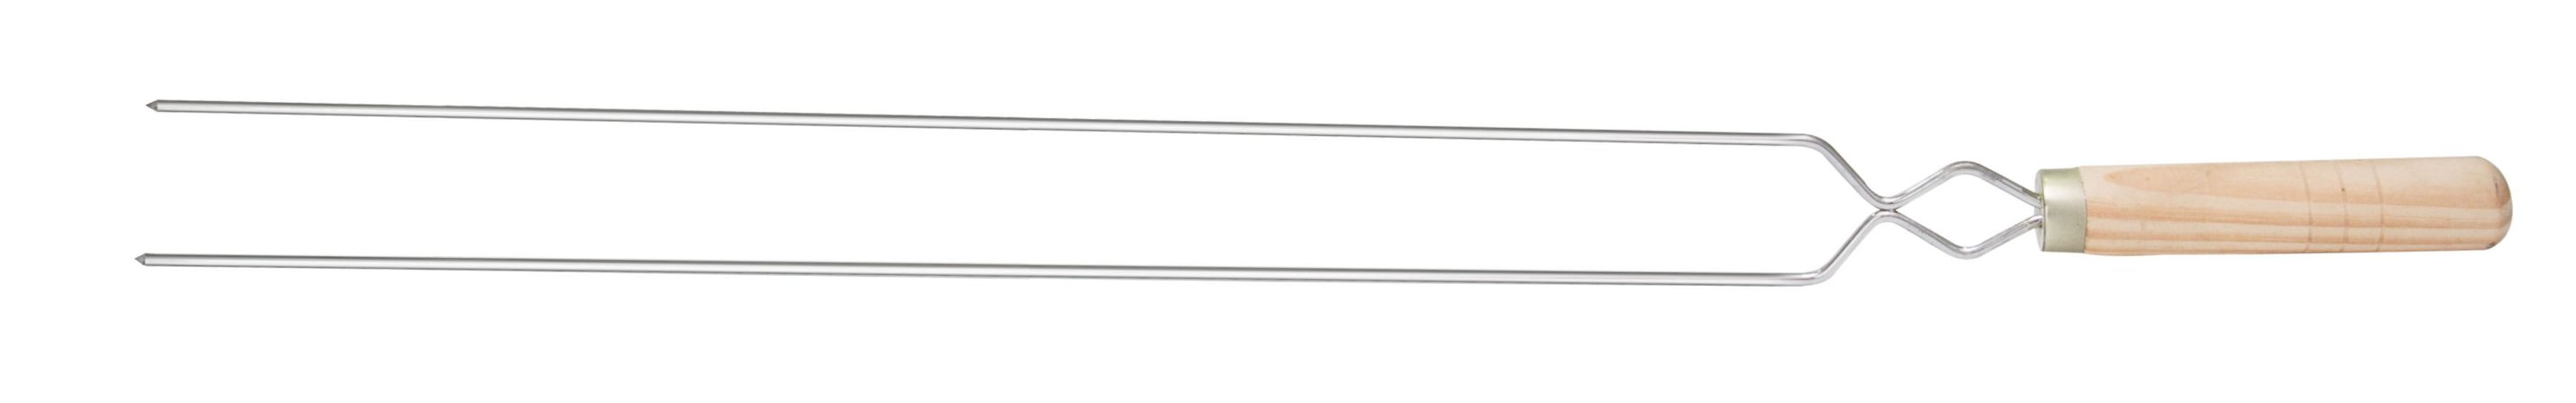 Espeto Duplo Pequeno 55cm Cromado